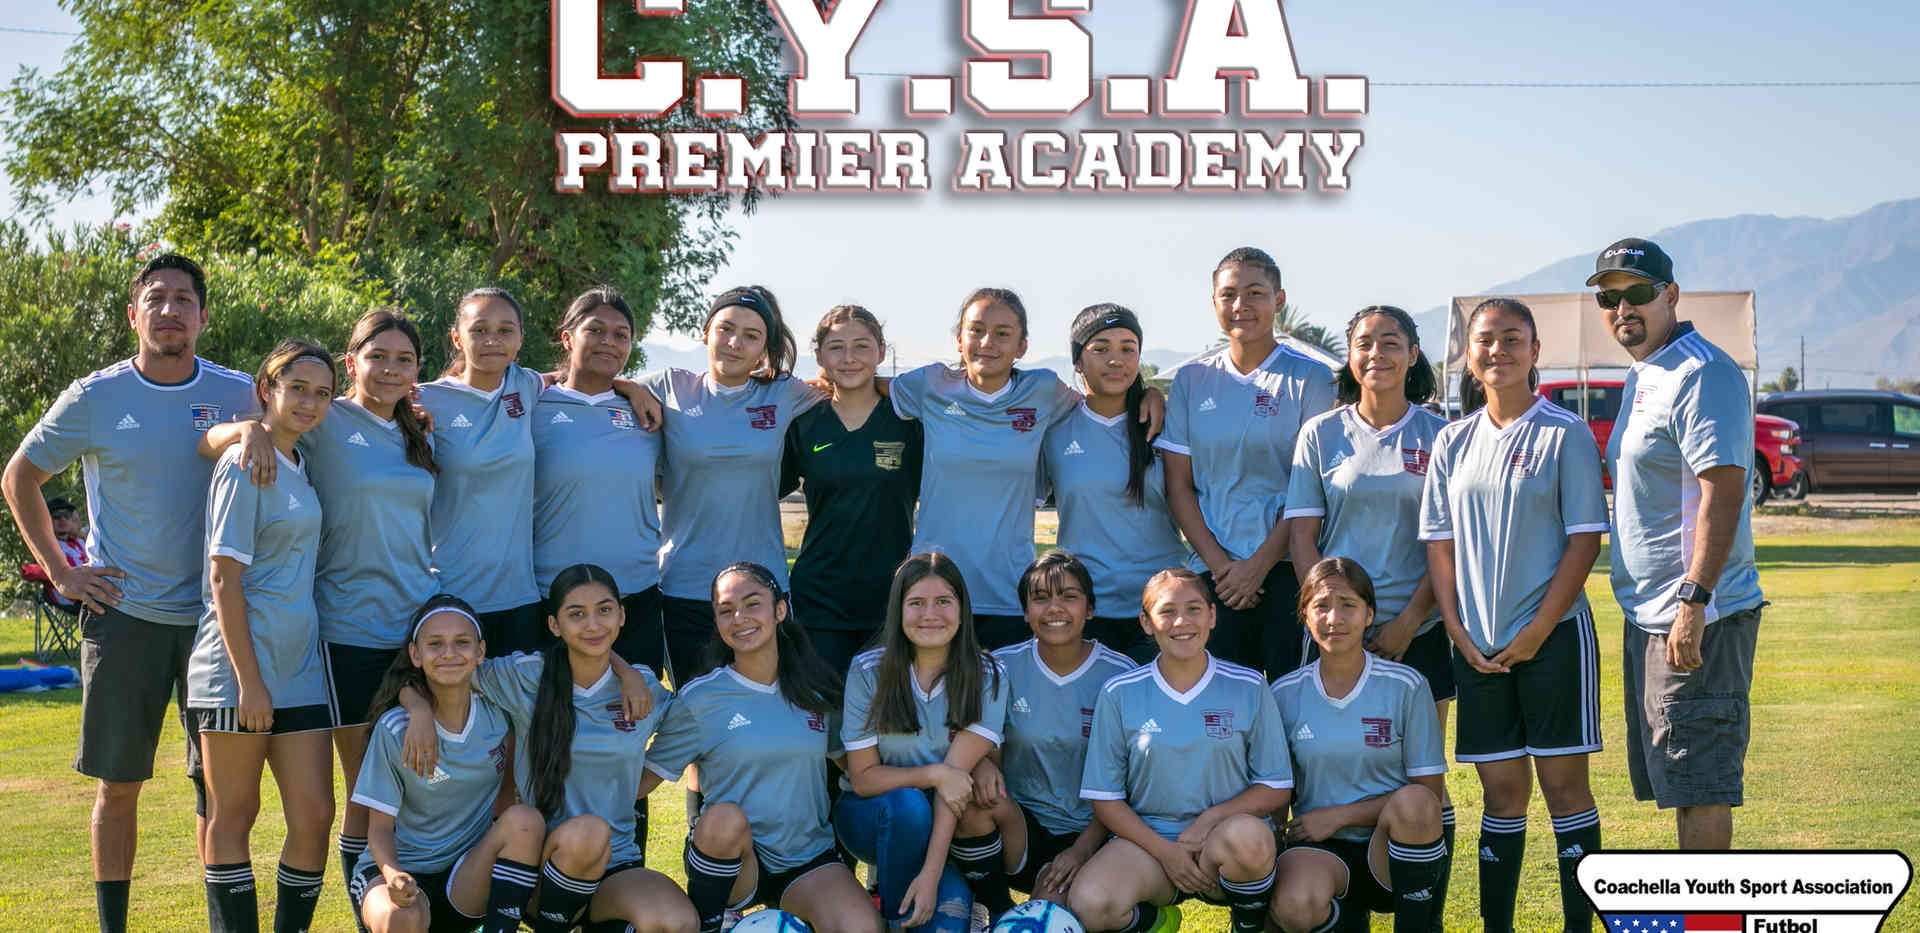 Cysa girls 2 coaches.jpg